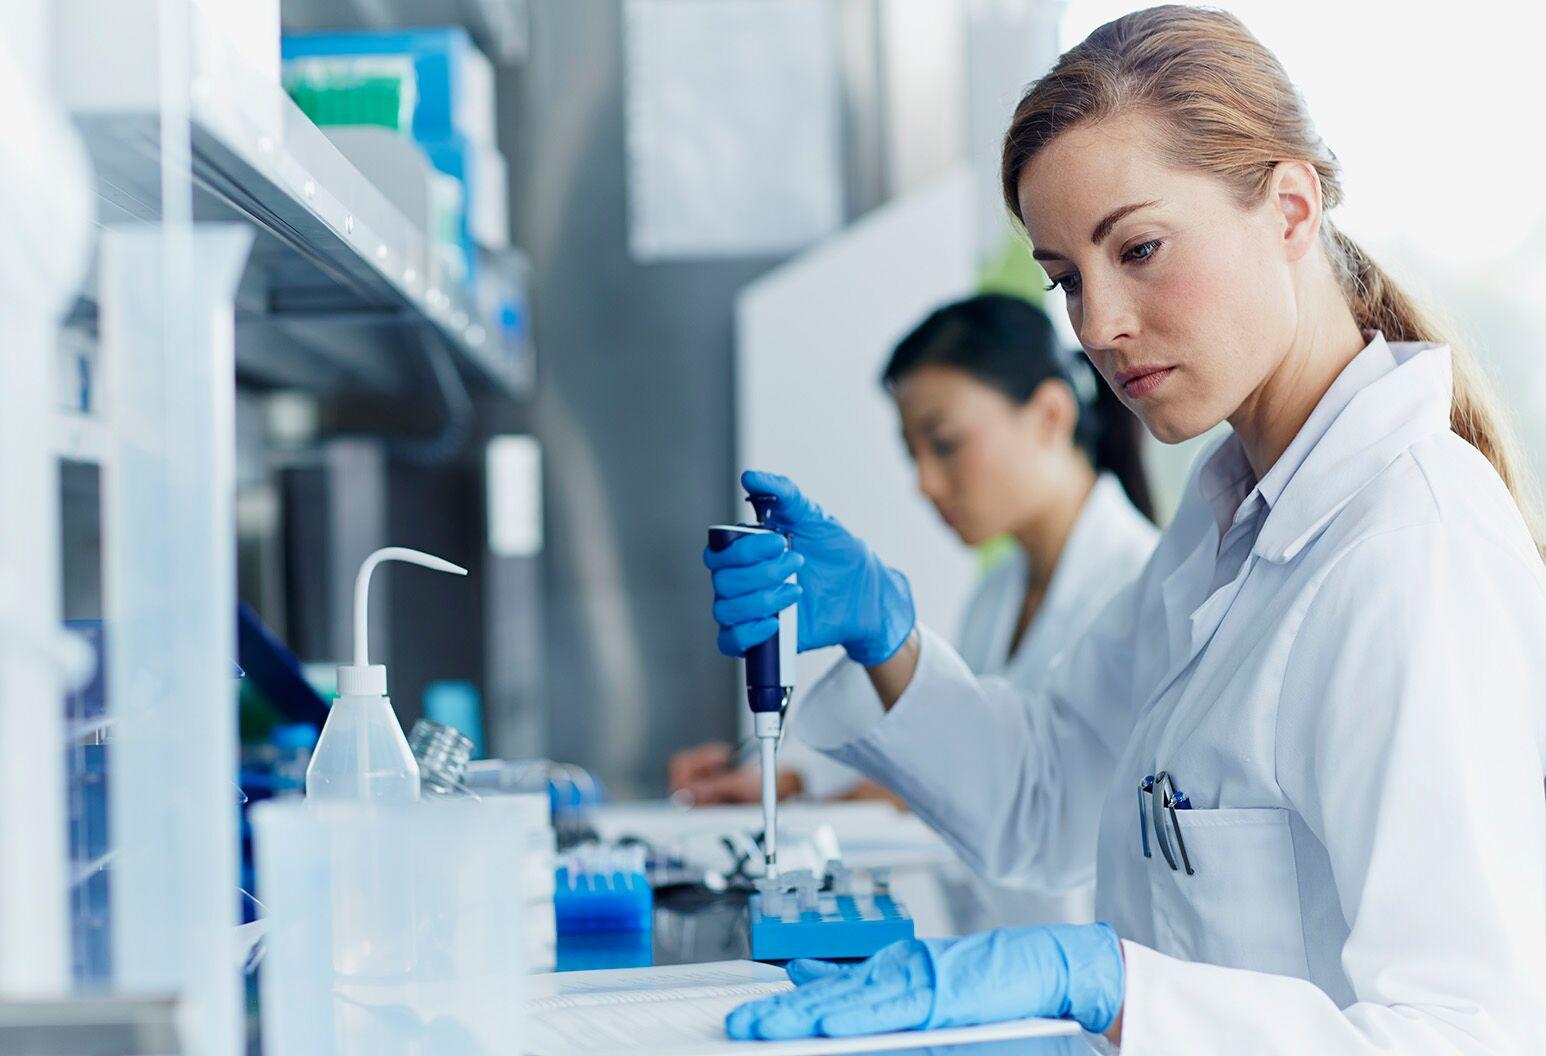 Female scientist in the lab.